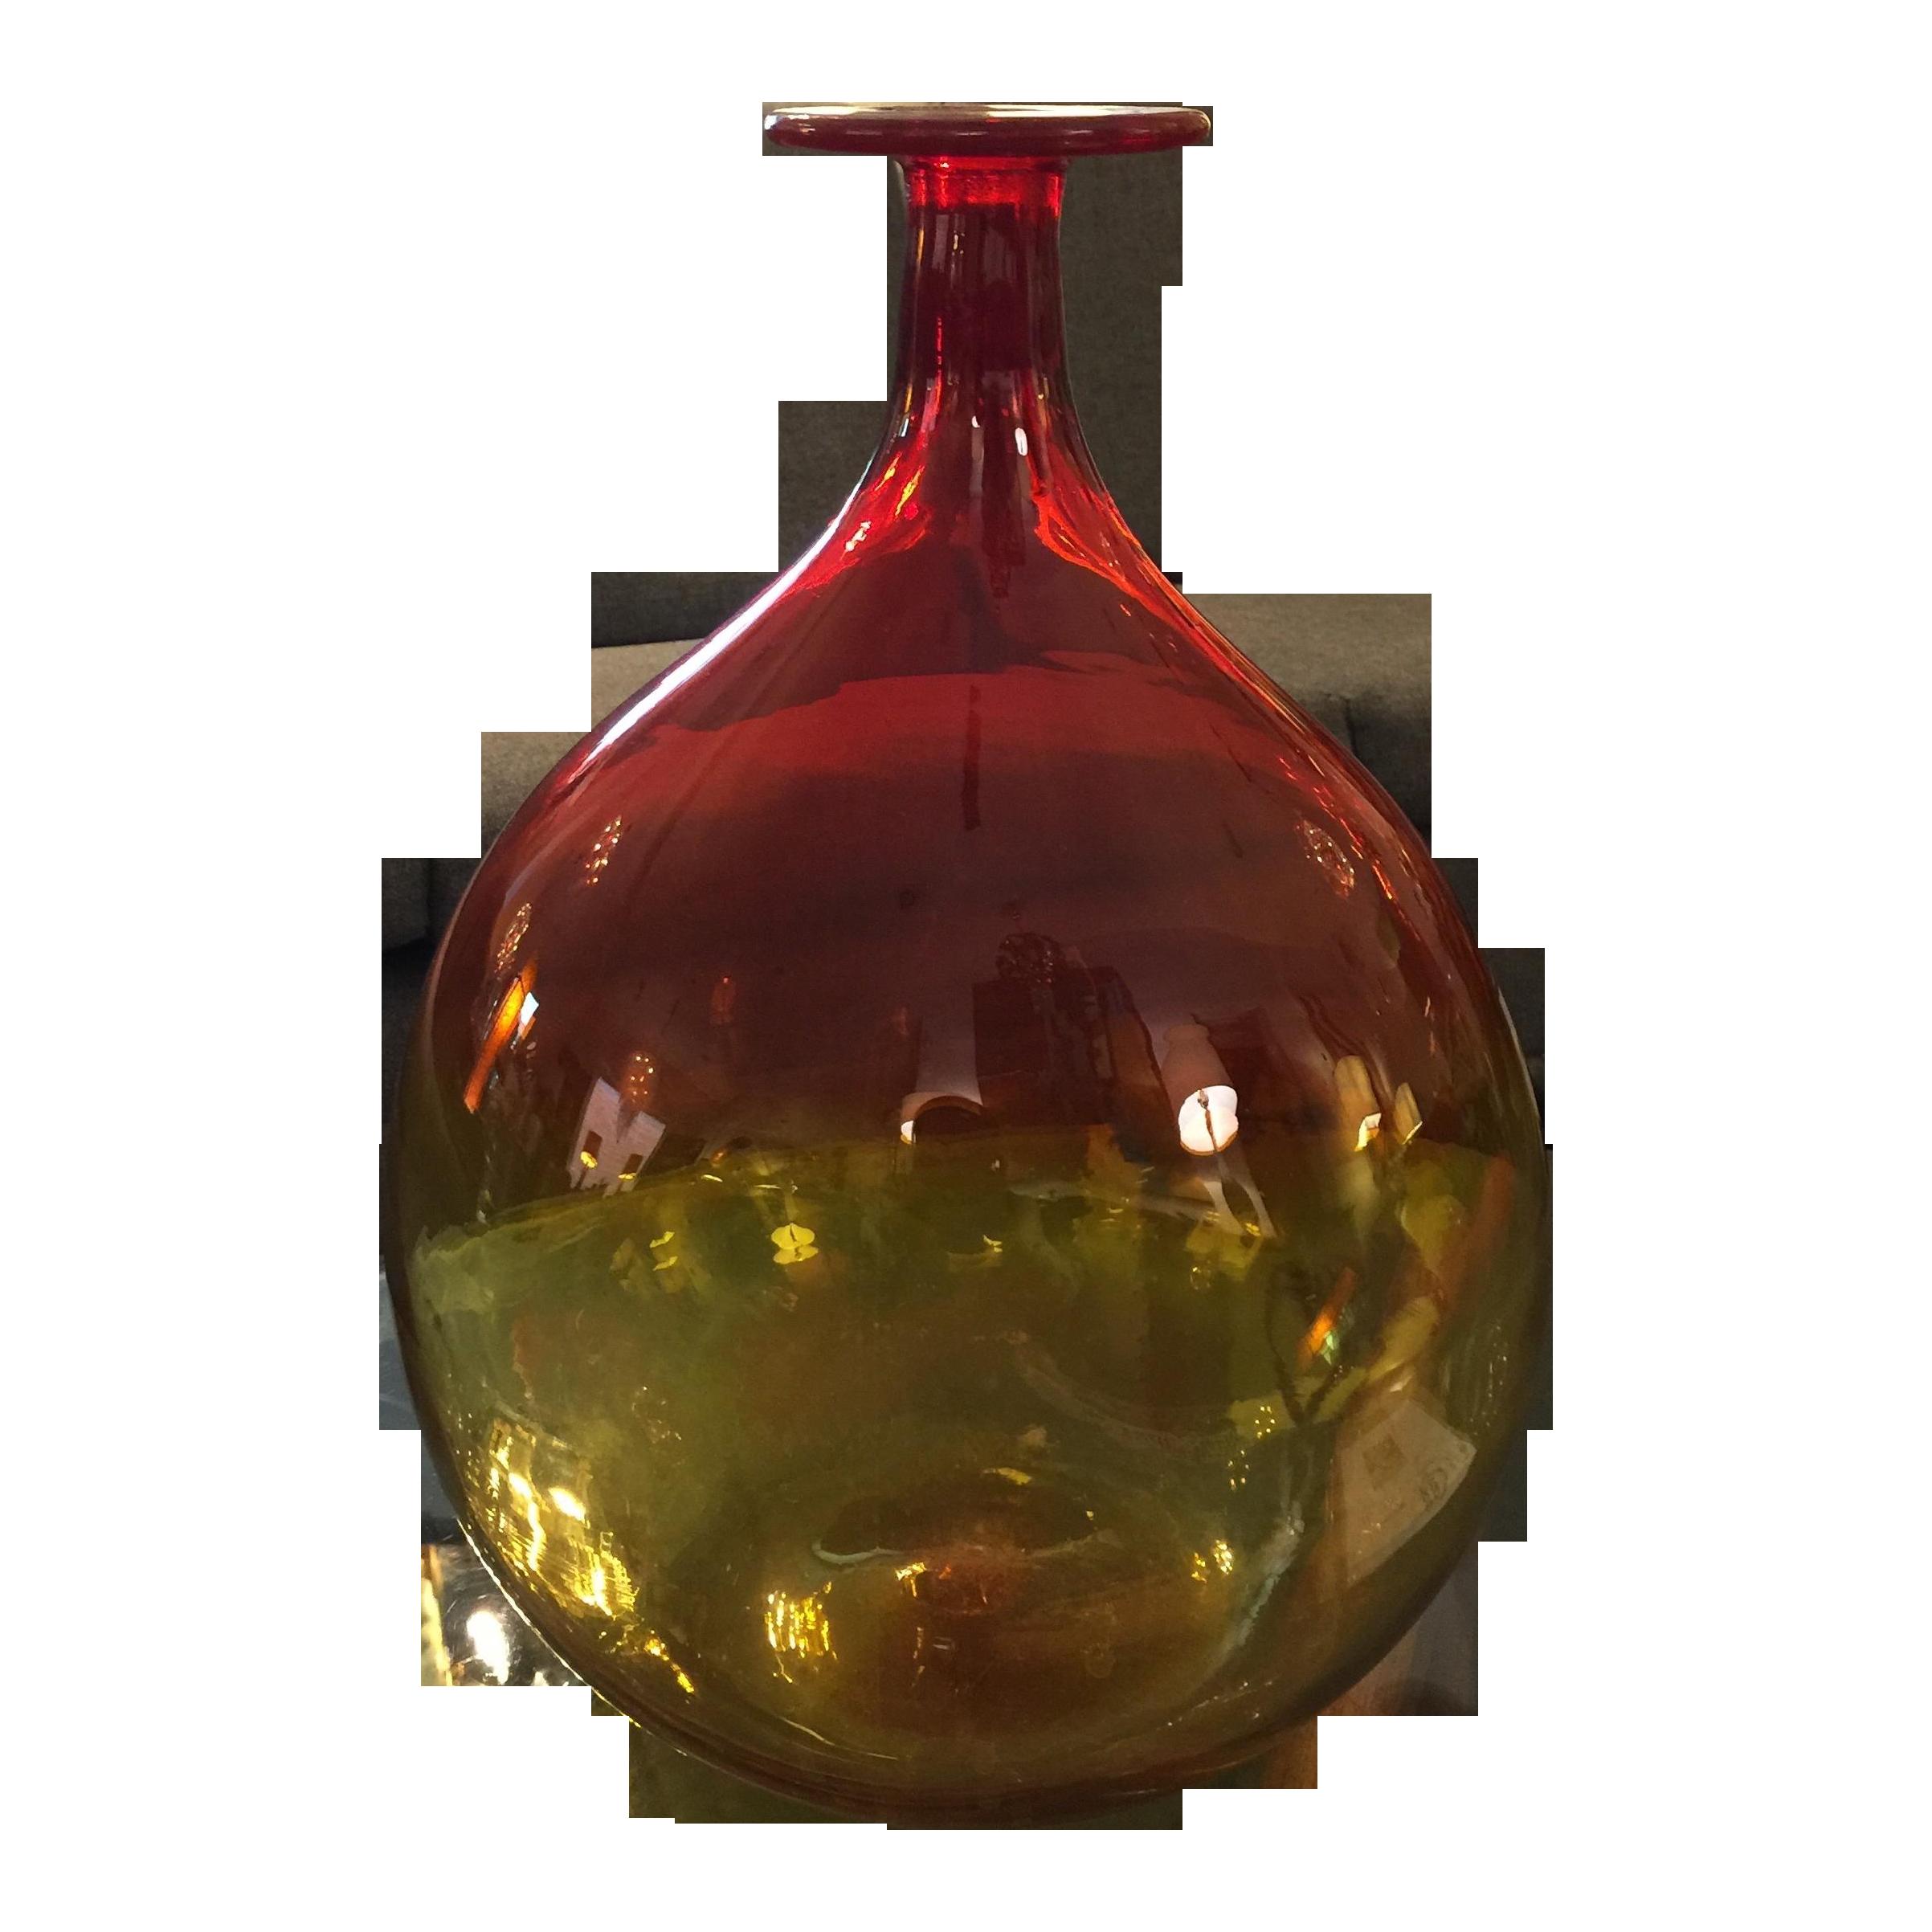 Blenko Hand Blown Art Glass Vase Chairish